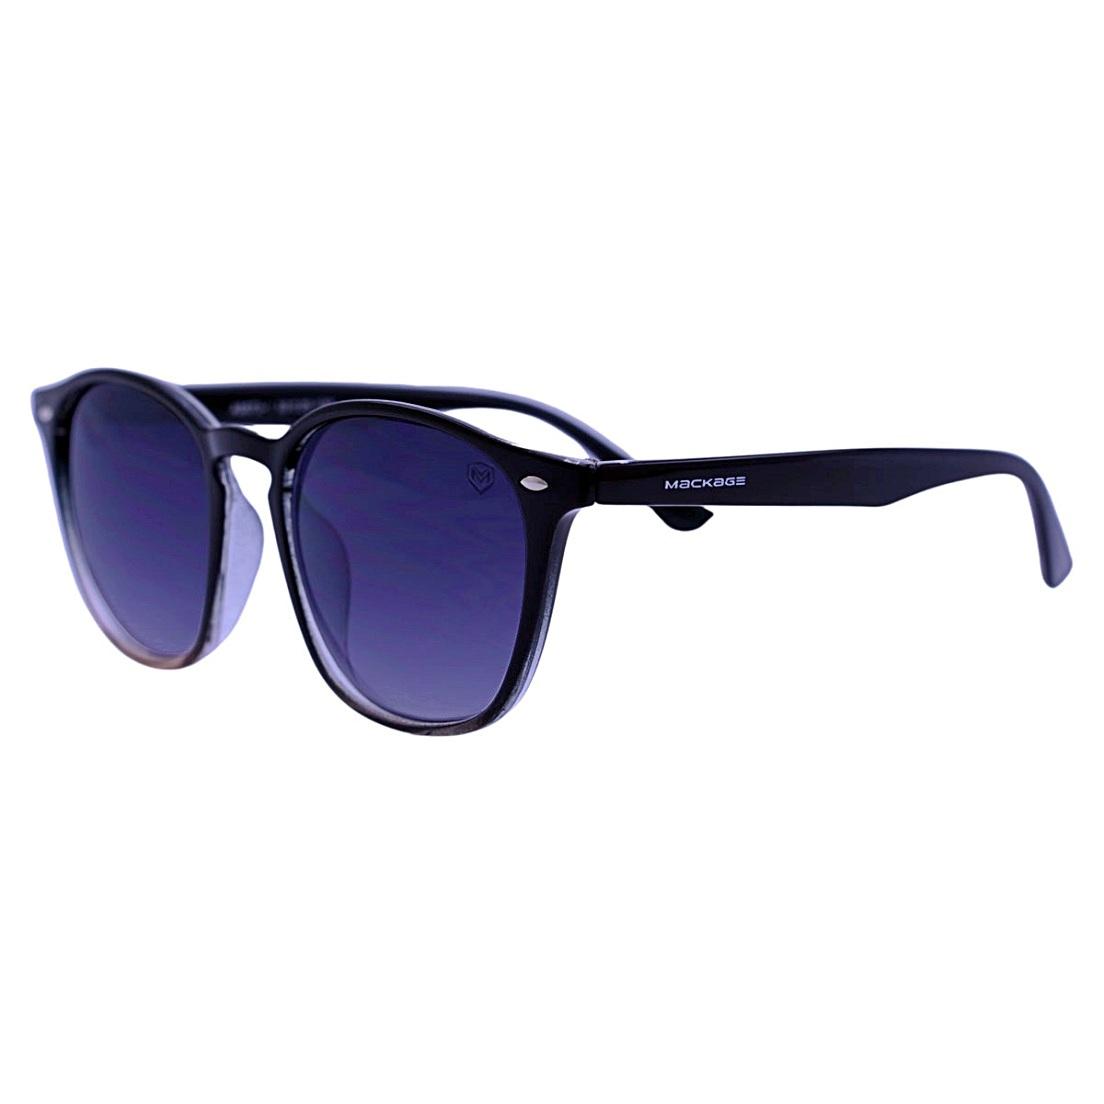 Óculos De Sol Mackage Unissex Acetato Quadrado Wayfarer - Preto